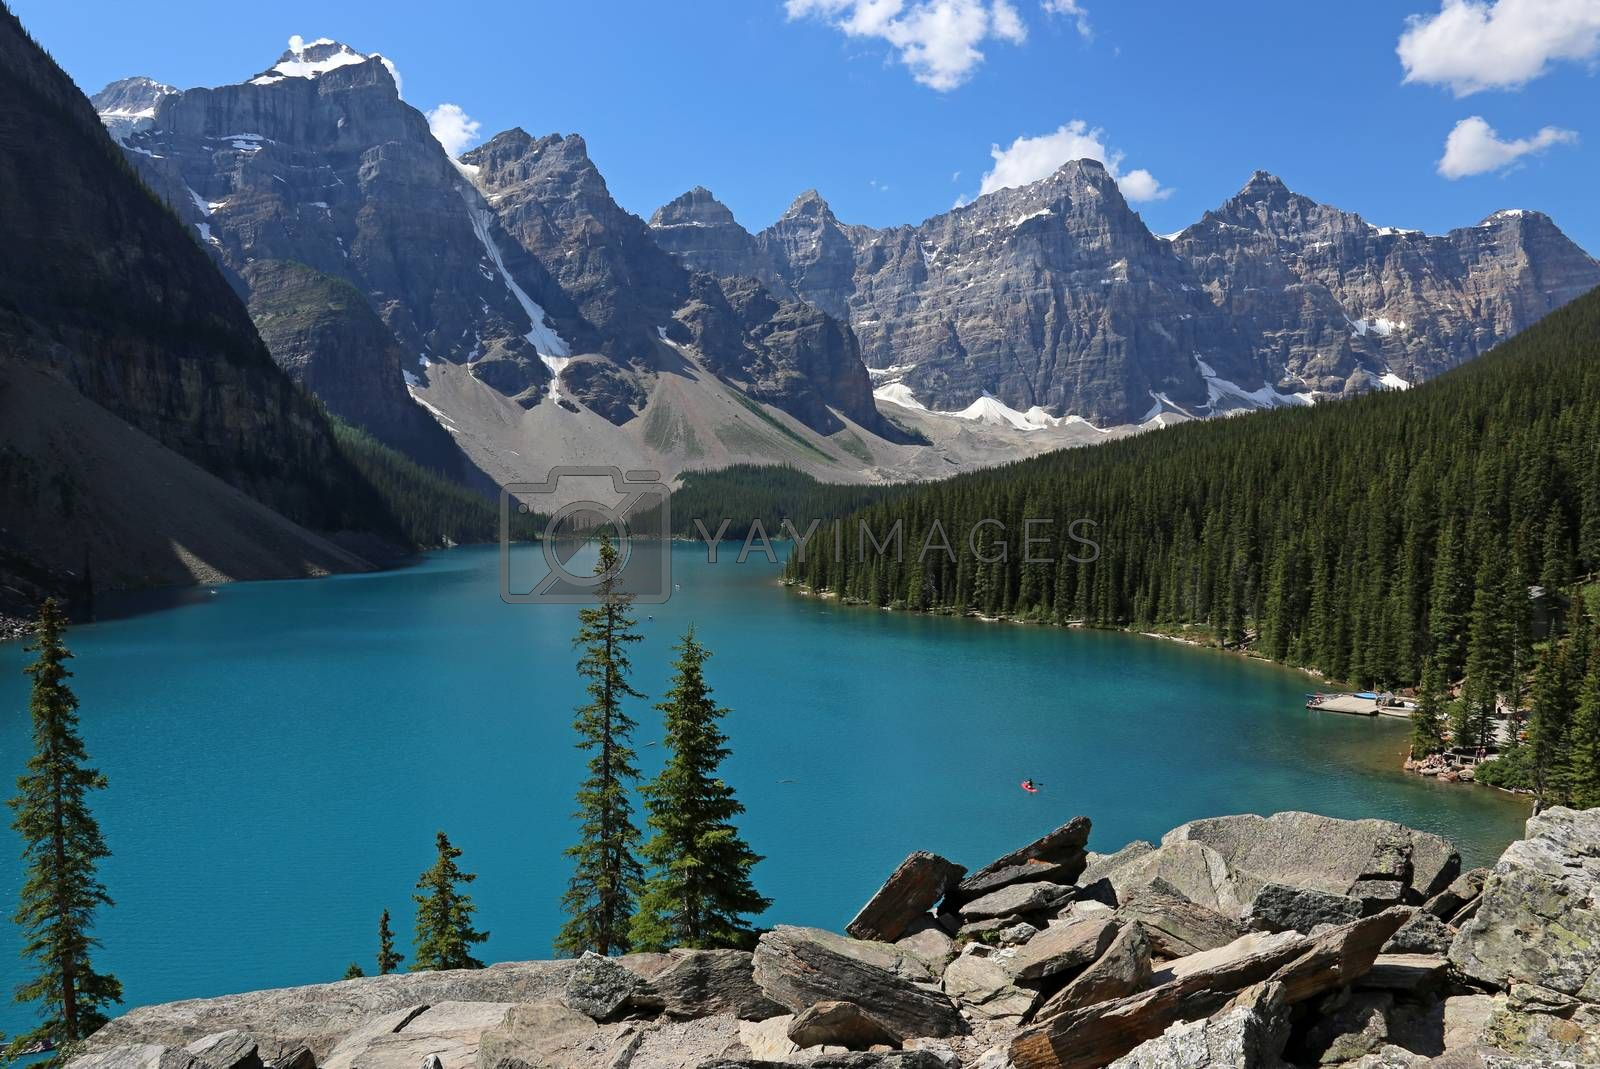 Spectacular Lake Moraine, located in Banff National Park, Alberta, Canada.